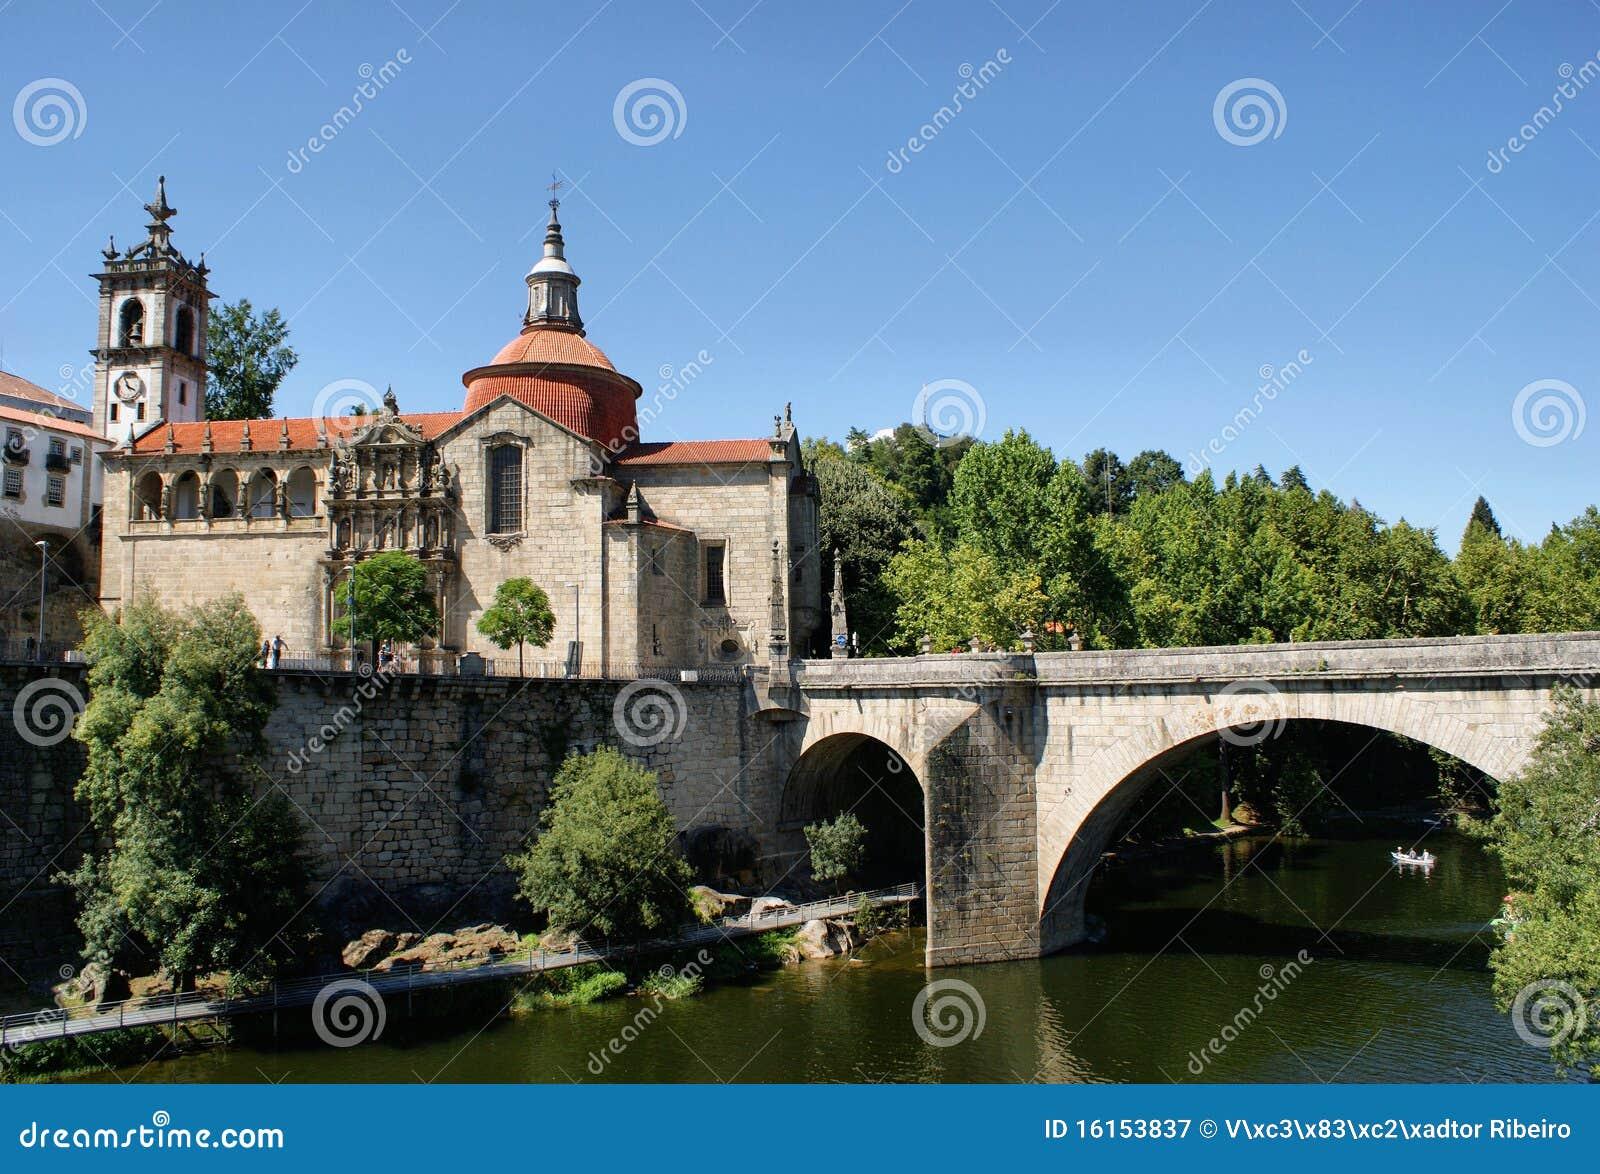 Bridge over River Tamega